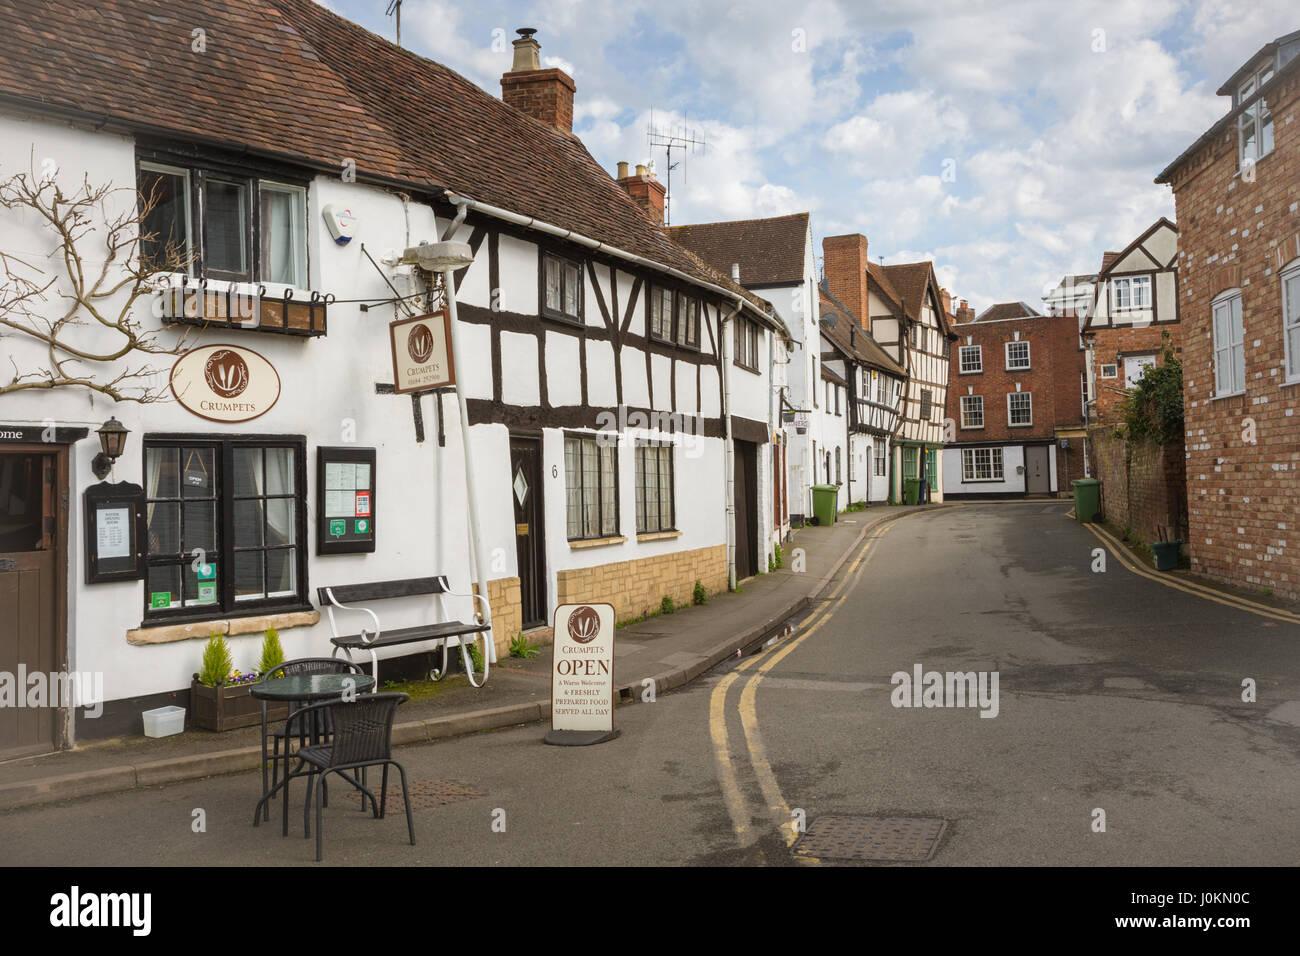 Back street in Tewkesbury, Glocestershire UK showing tudor style architecture Britain - Stock Image